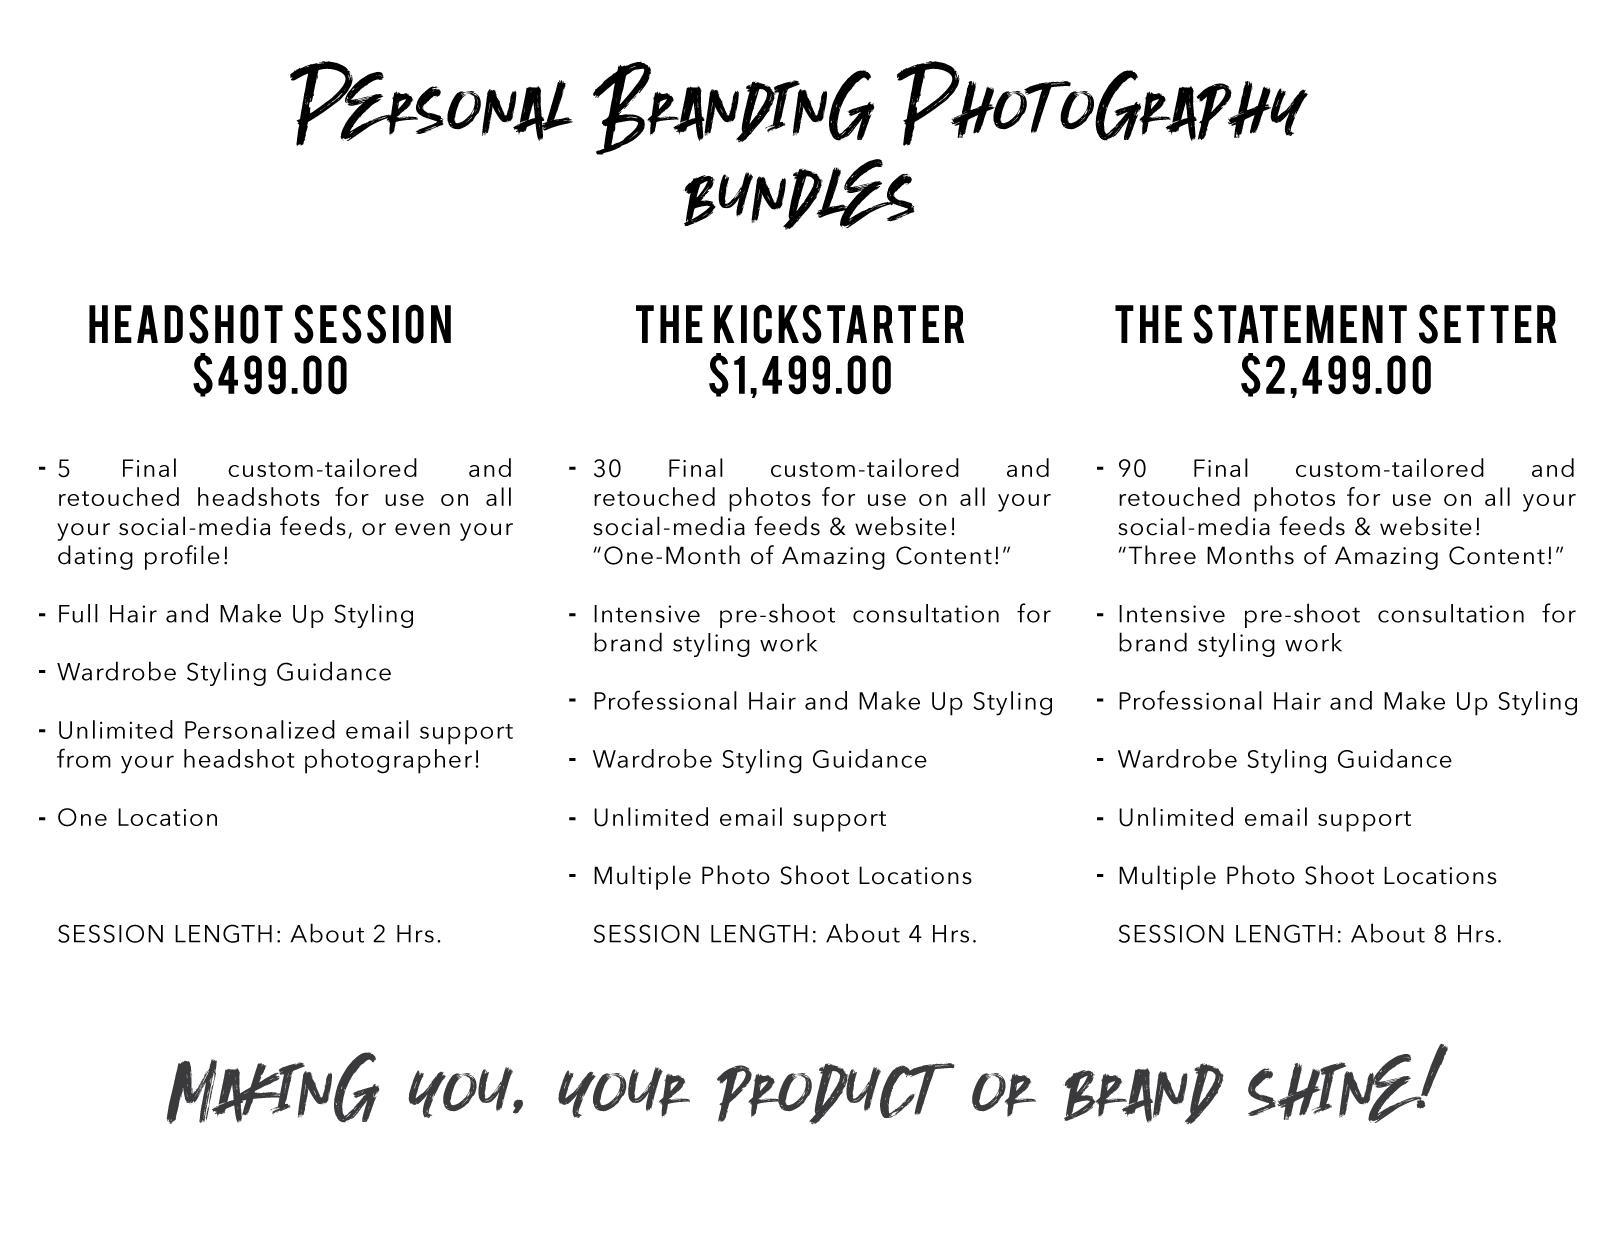 PBP-Pricing-List-White.jpg